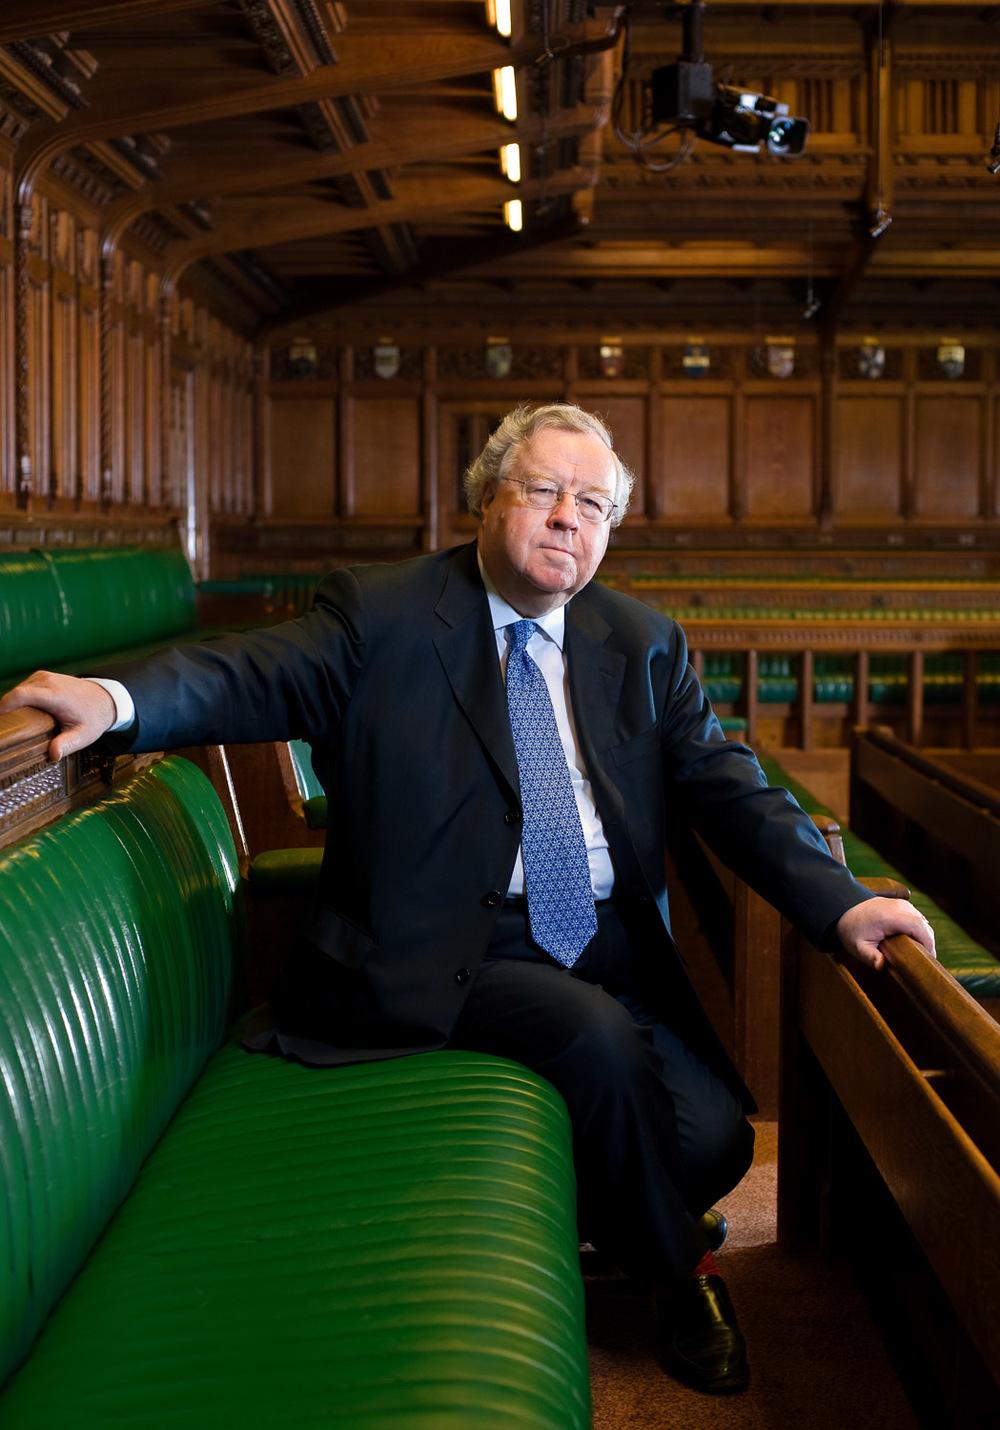 Sir Patrick Cormack MP